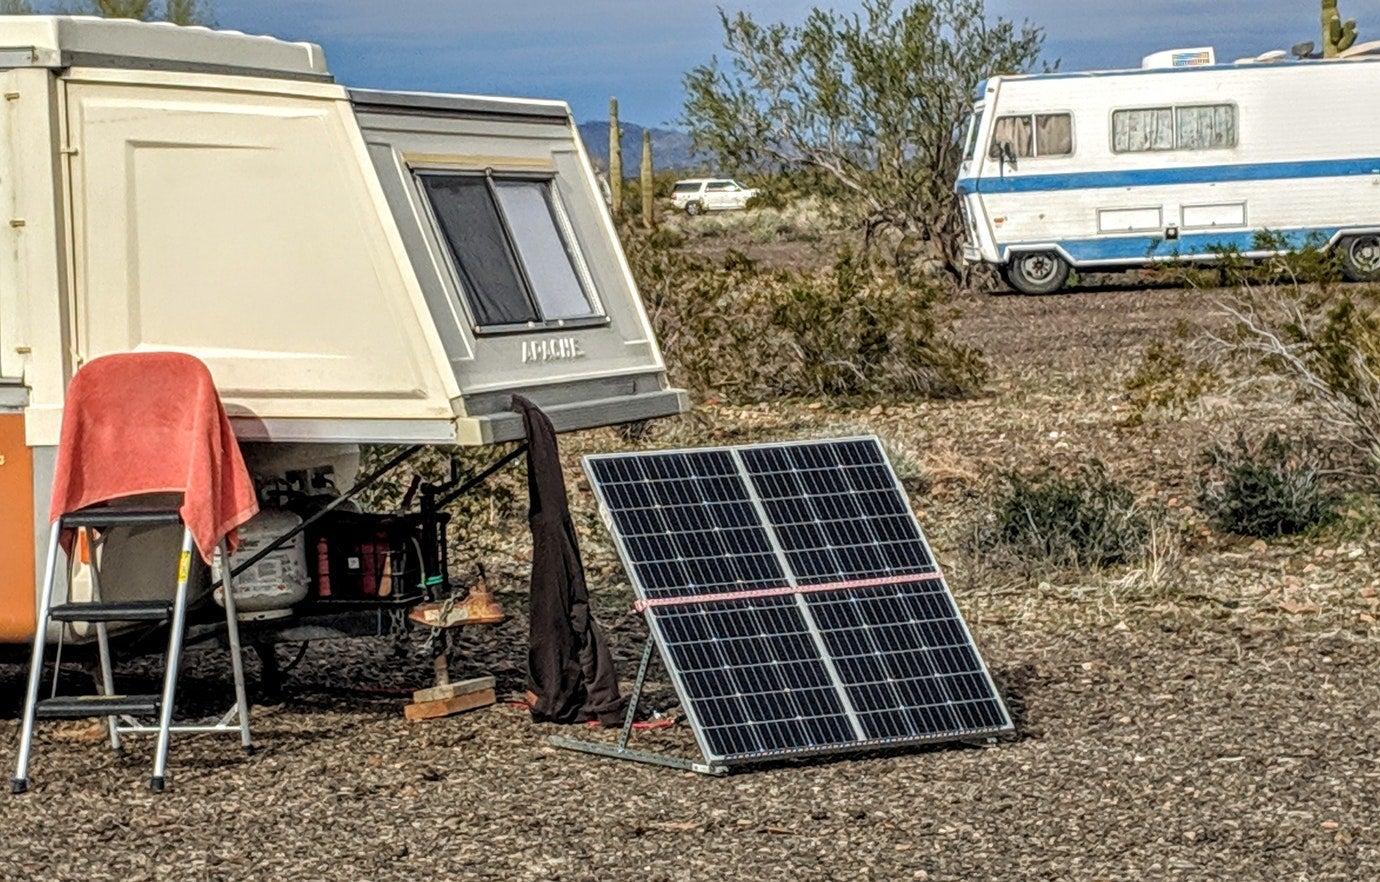 solar panel resting on gravel ground beside pop out trailer